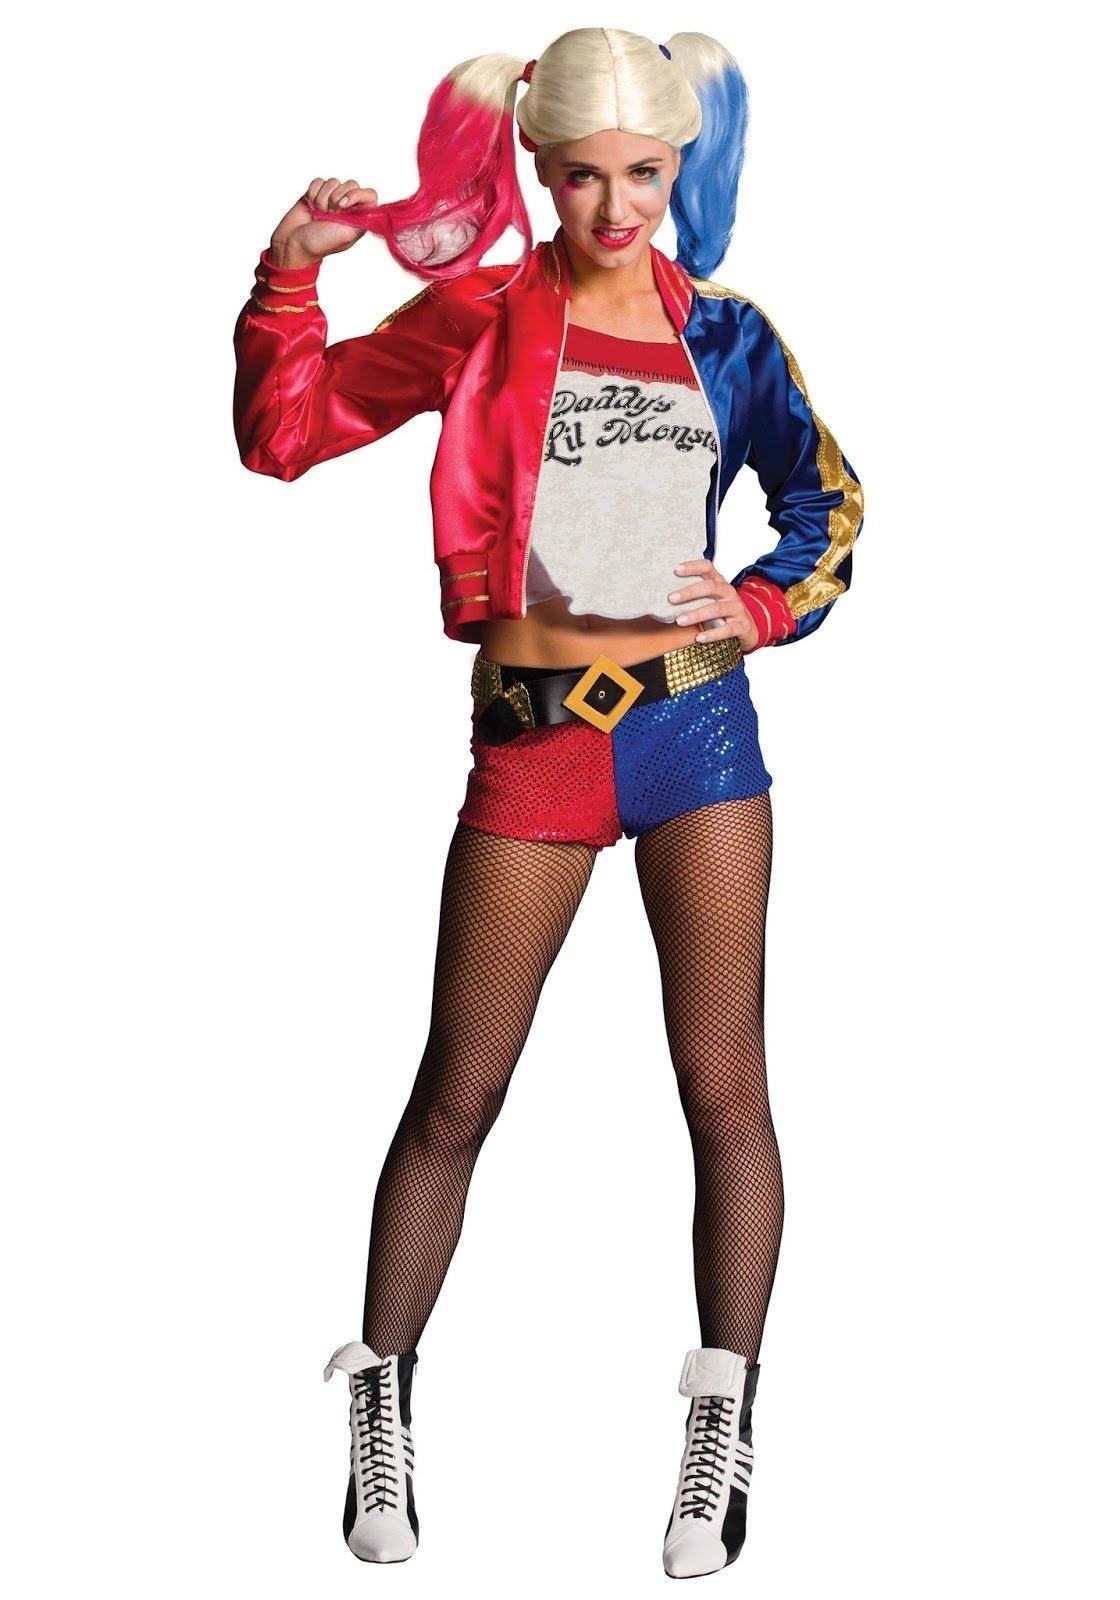 10 Awesome Good Costume Ideas For Teenage Girls halloween costumes for teenage girls for halloween 2016 halloween 7 2020